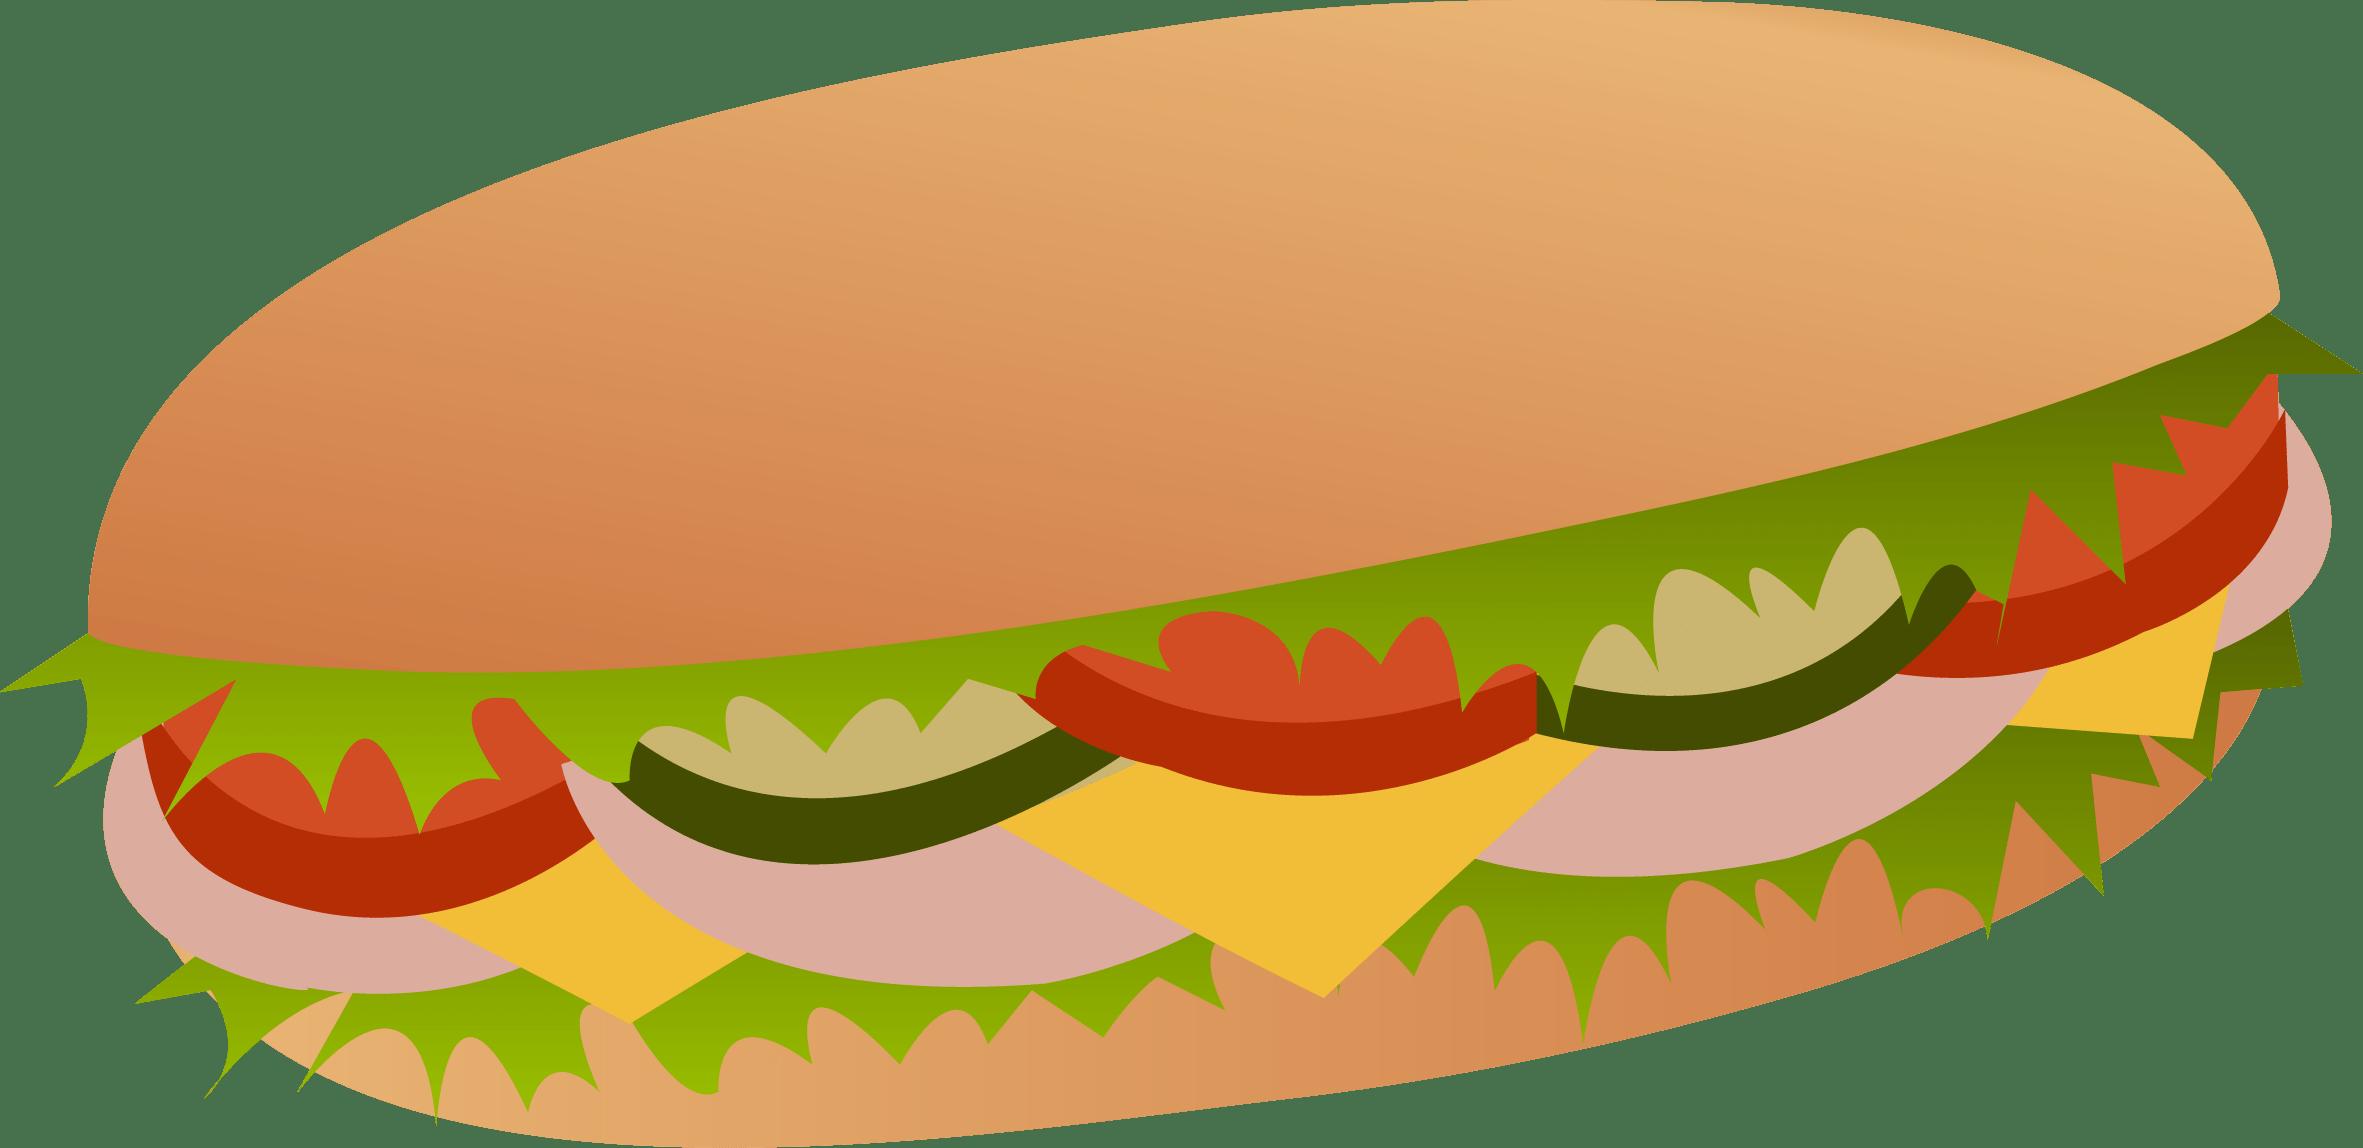 And cheese sandwich . Ham clipart sandwhich